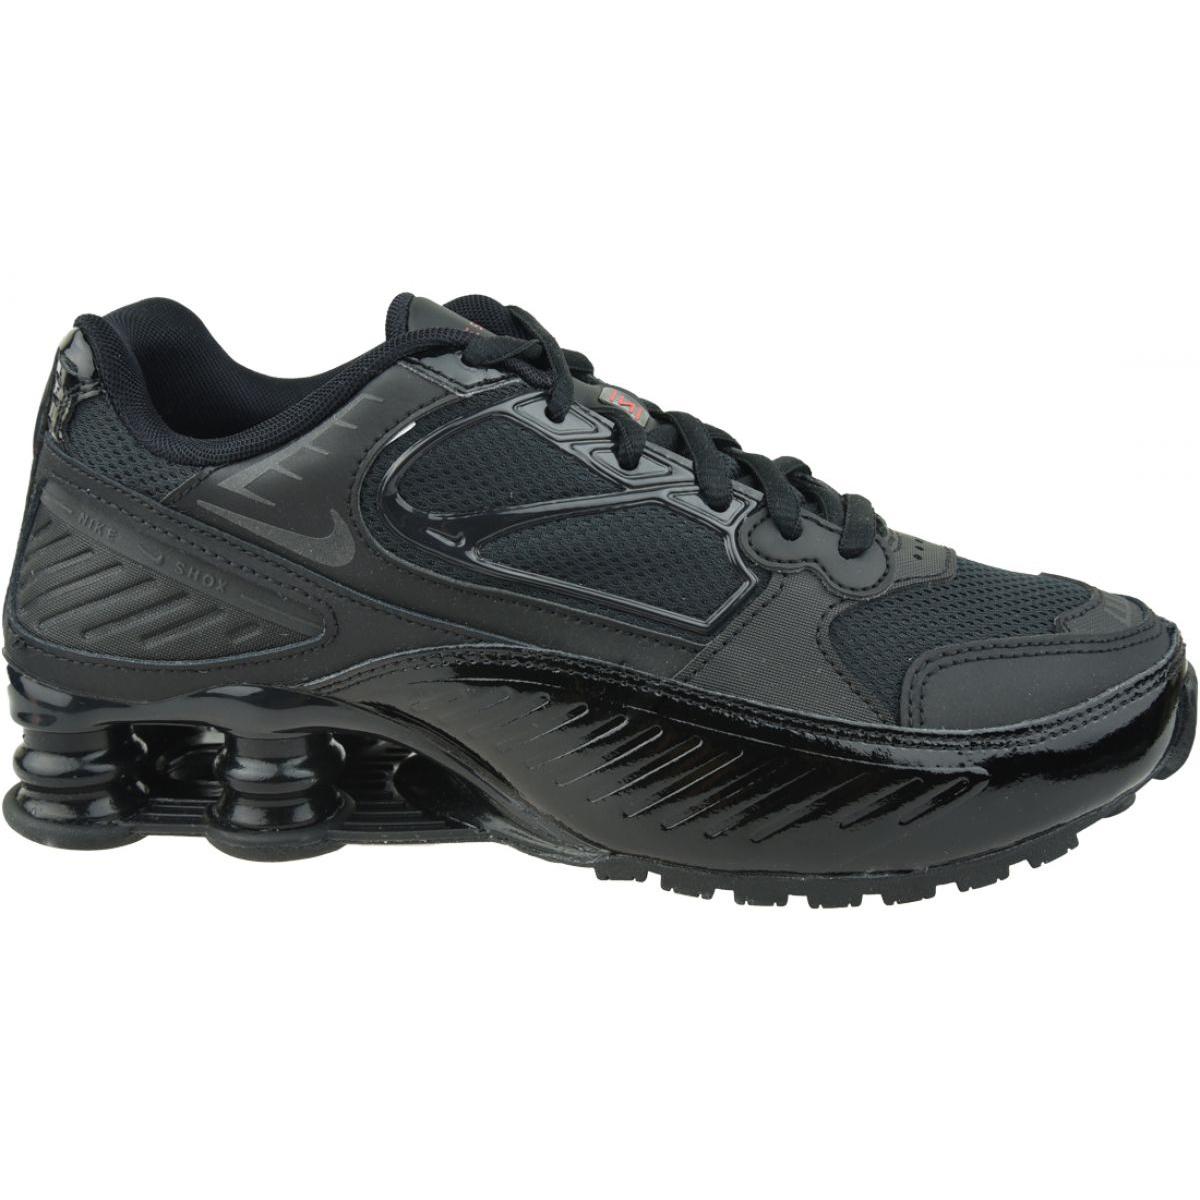 Sapatilhas Nike Wmns Shox Enigme 9000 W BQ9001 001 preto